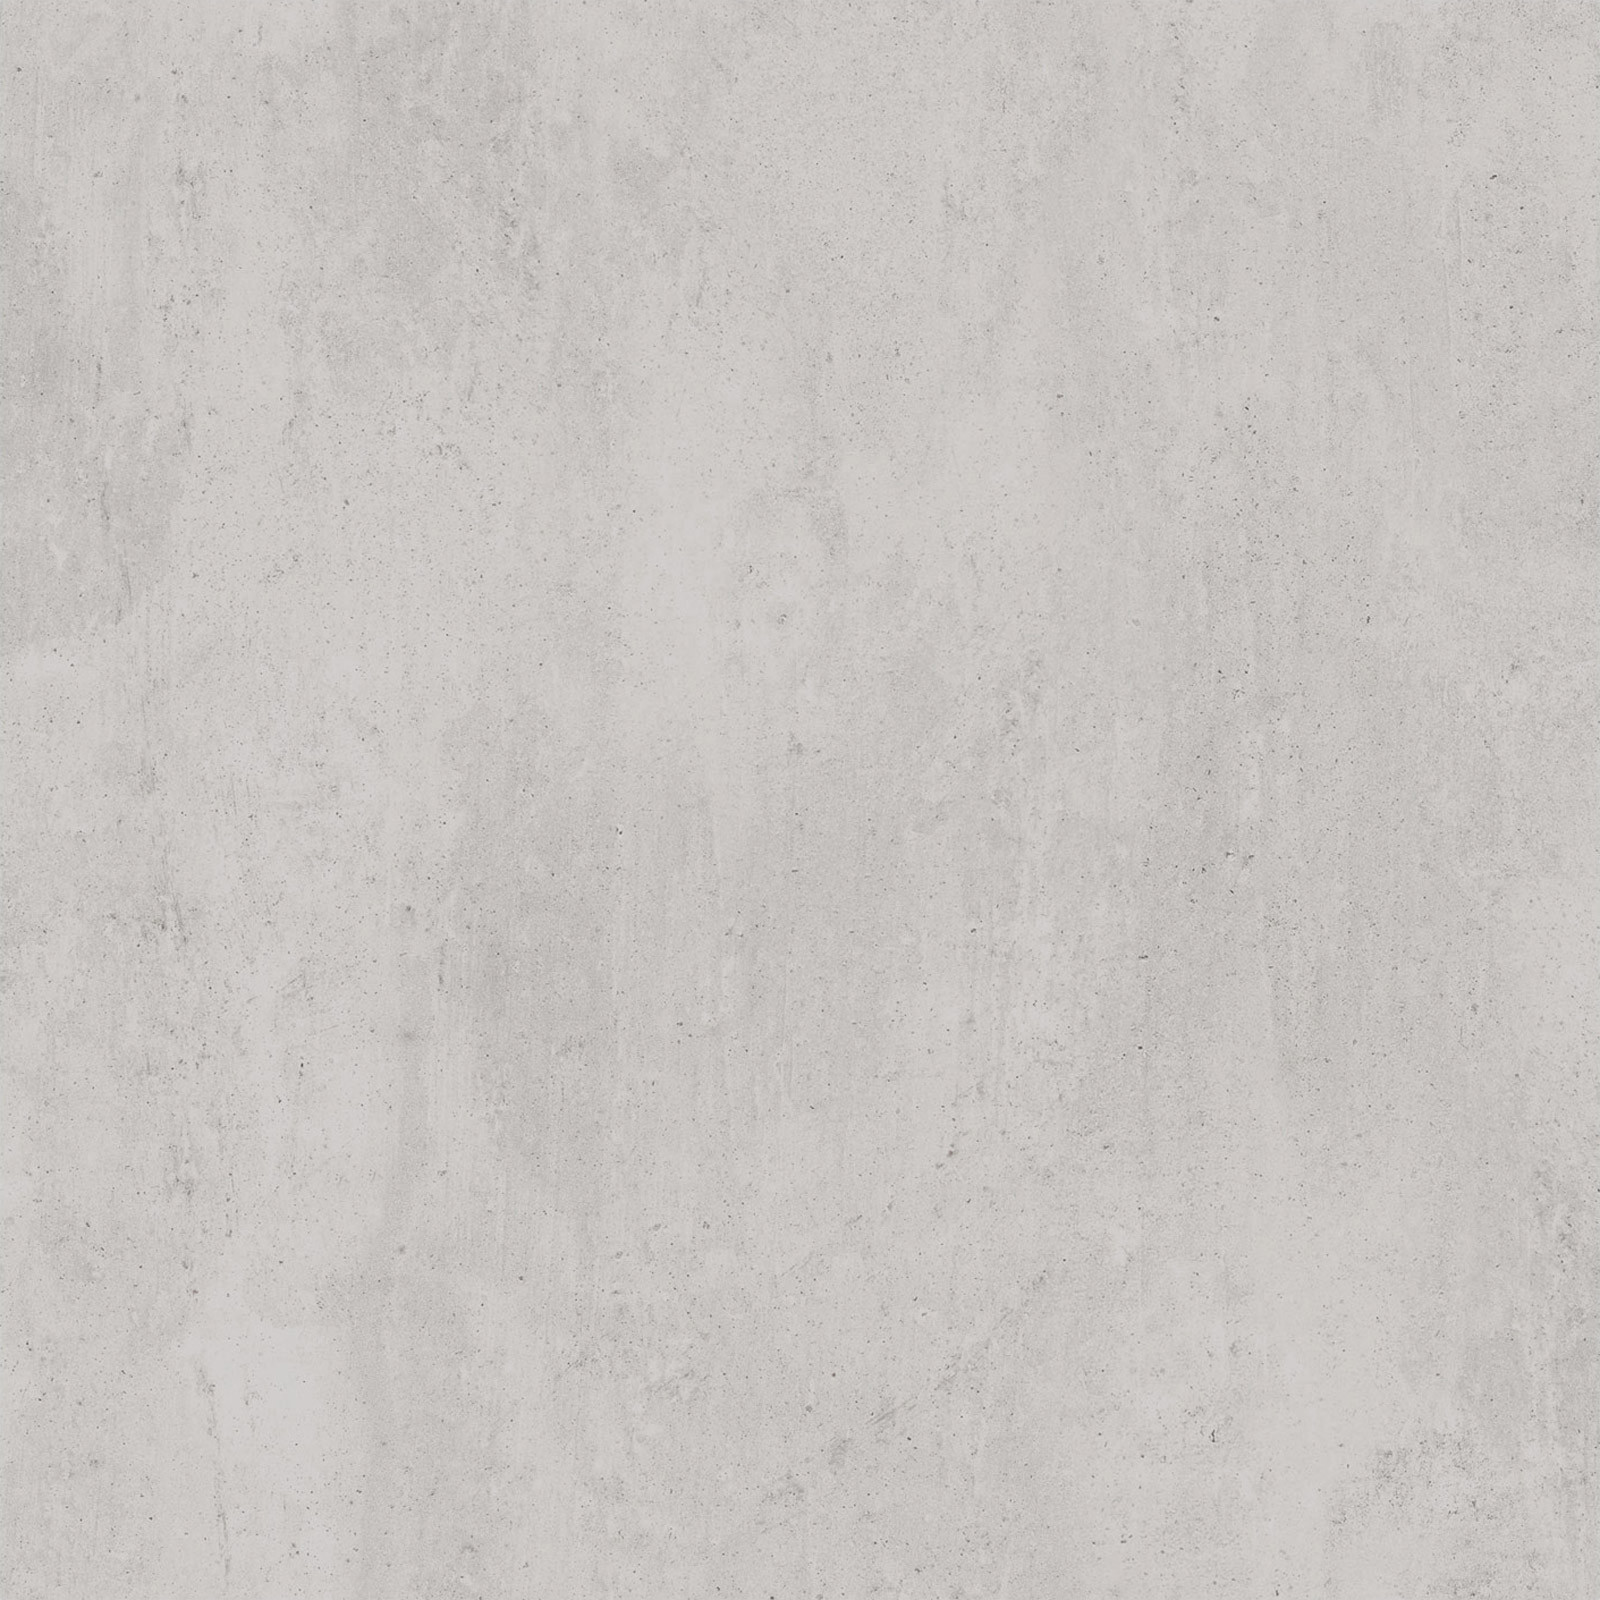 Cementi Light Grey Porcelain Wall Floor Tile